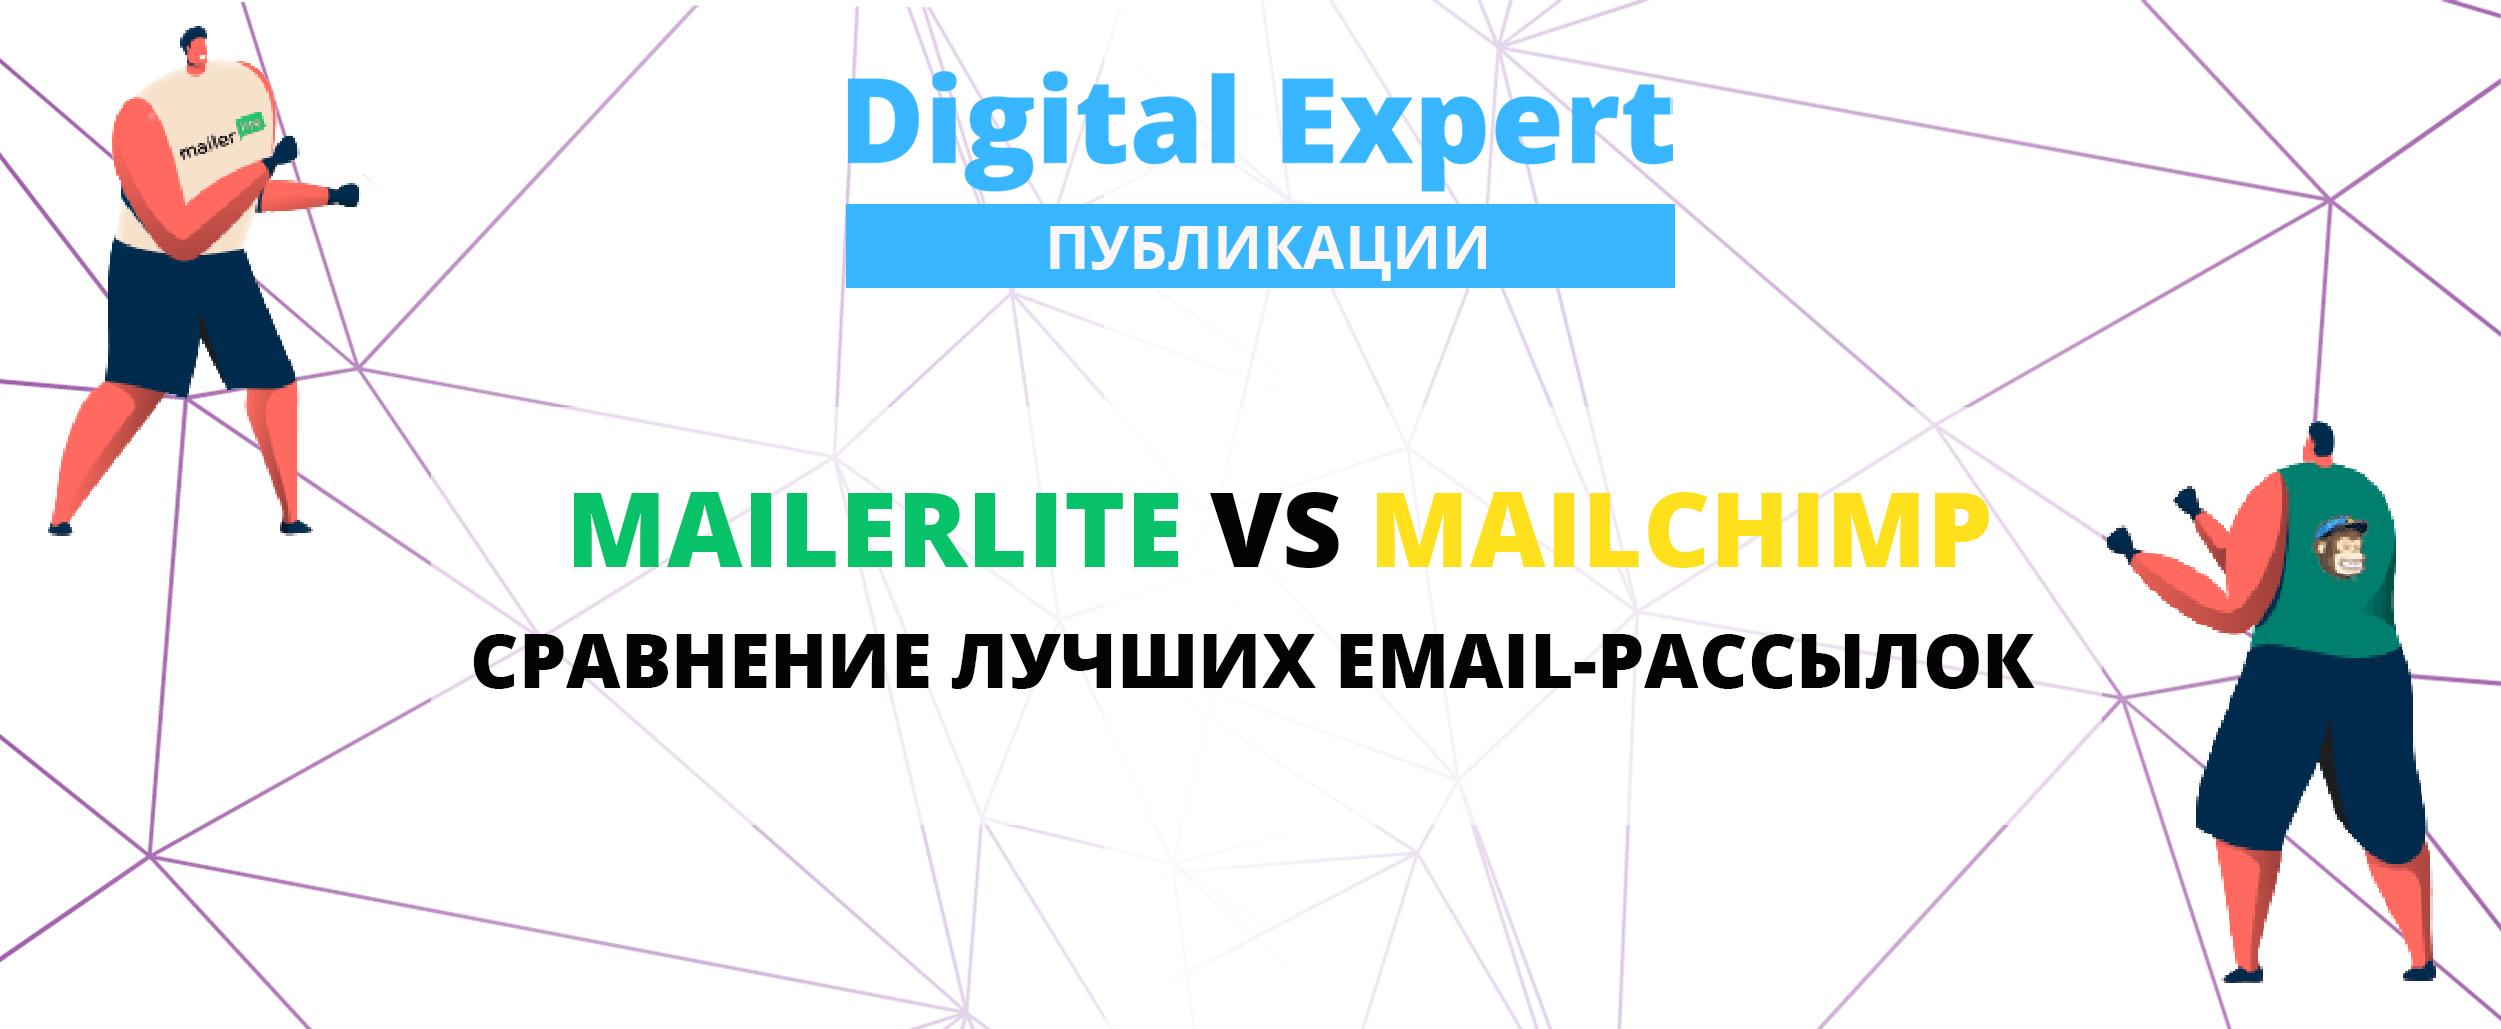 MailerLite vs Mailchimp: сравнение лучших email-рассылок